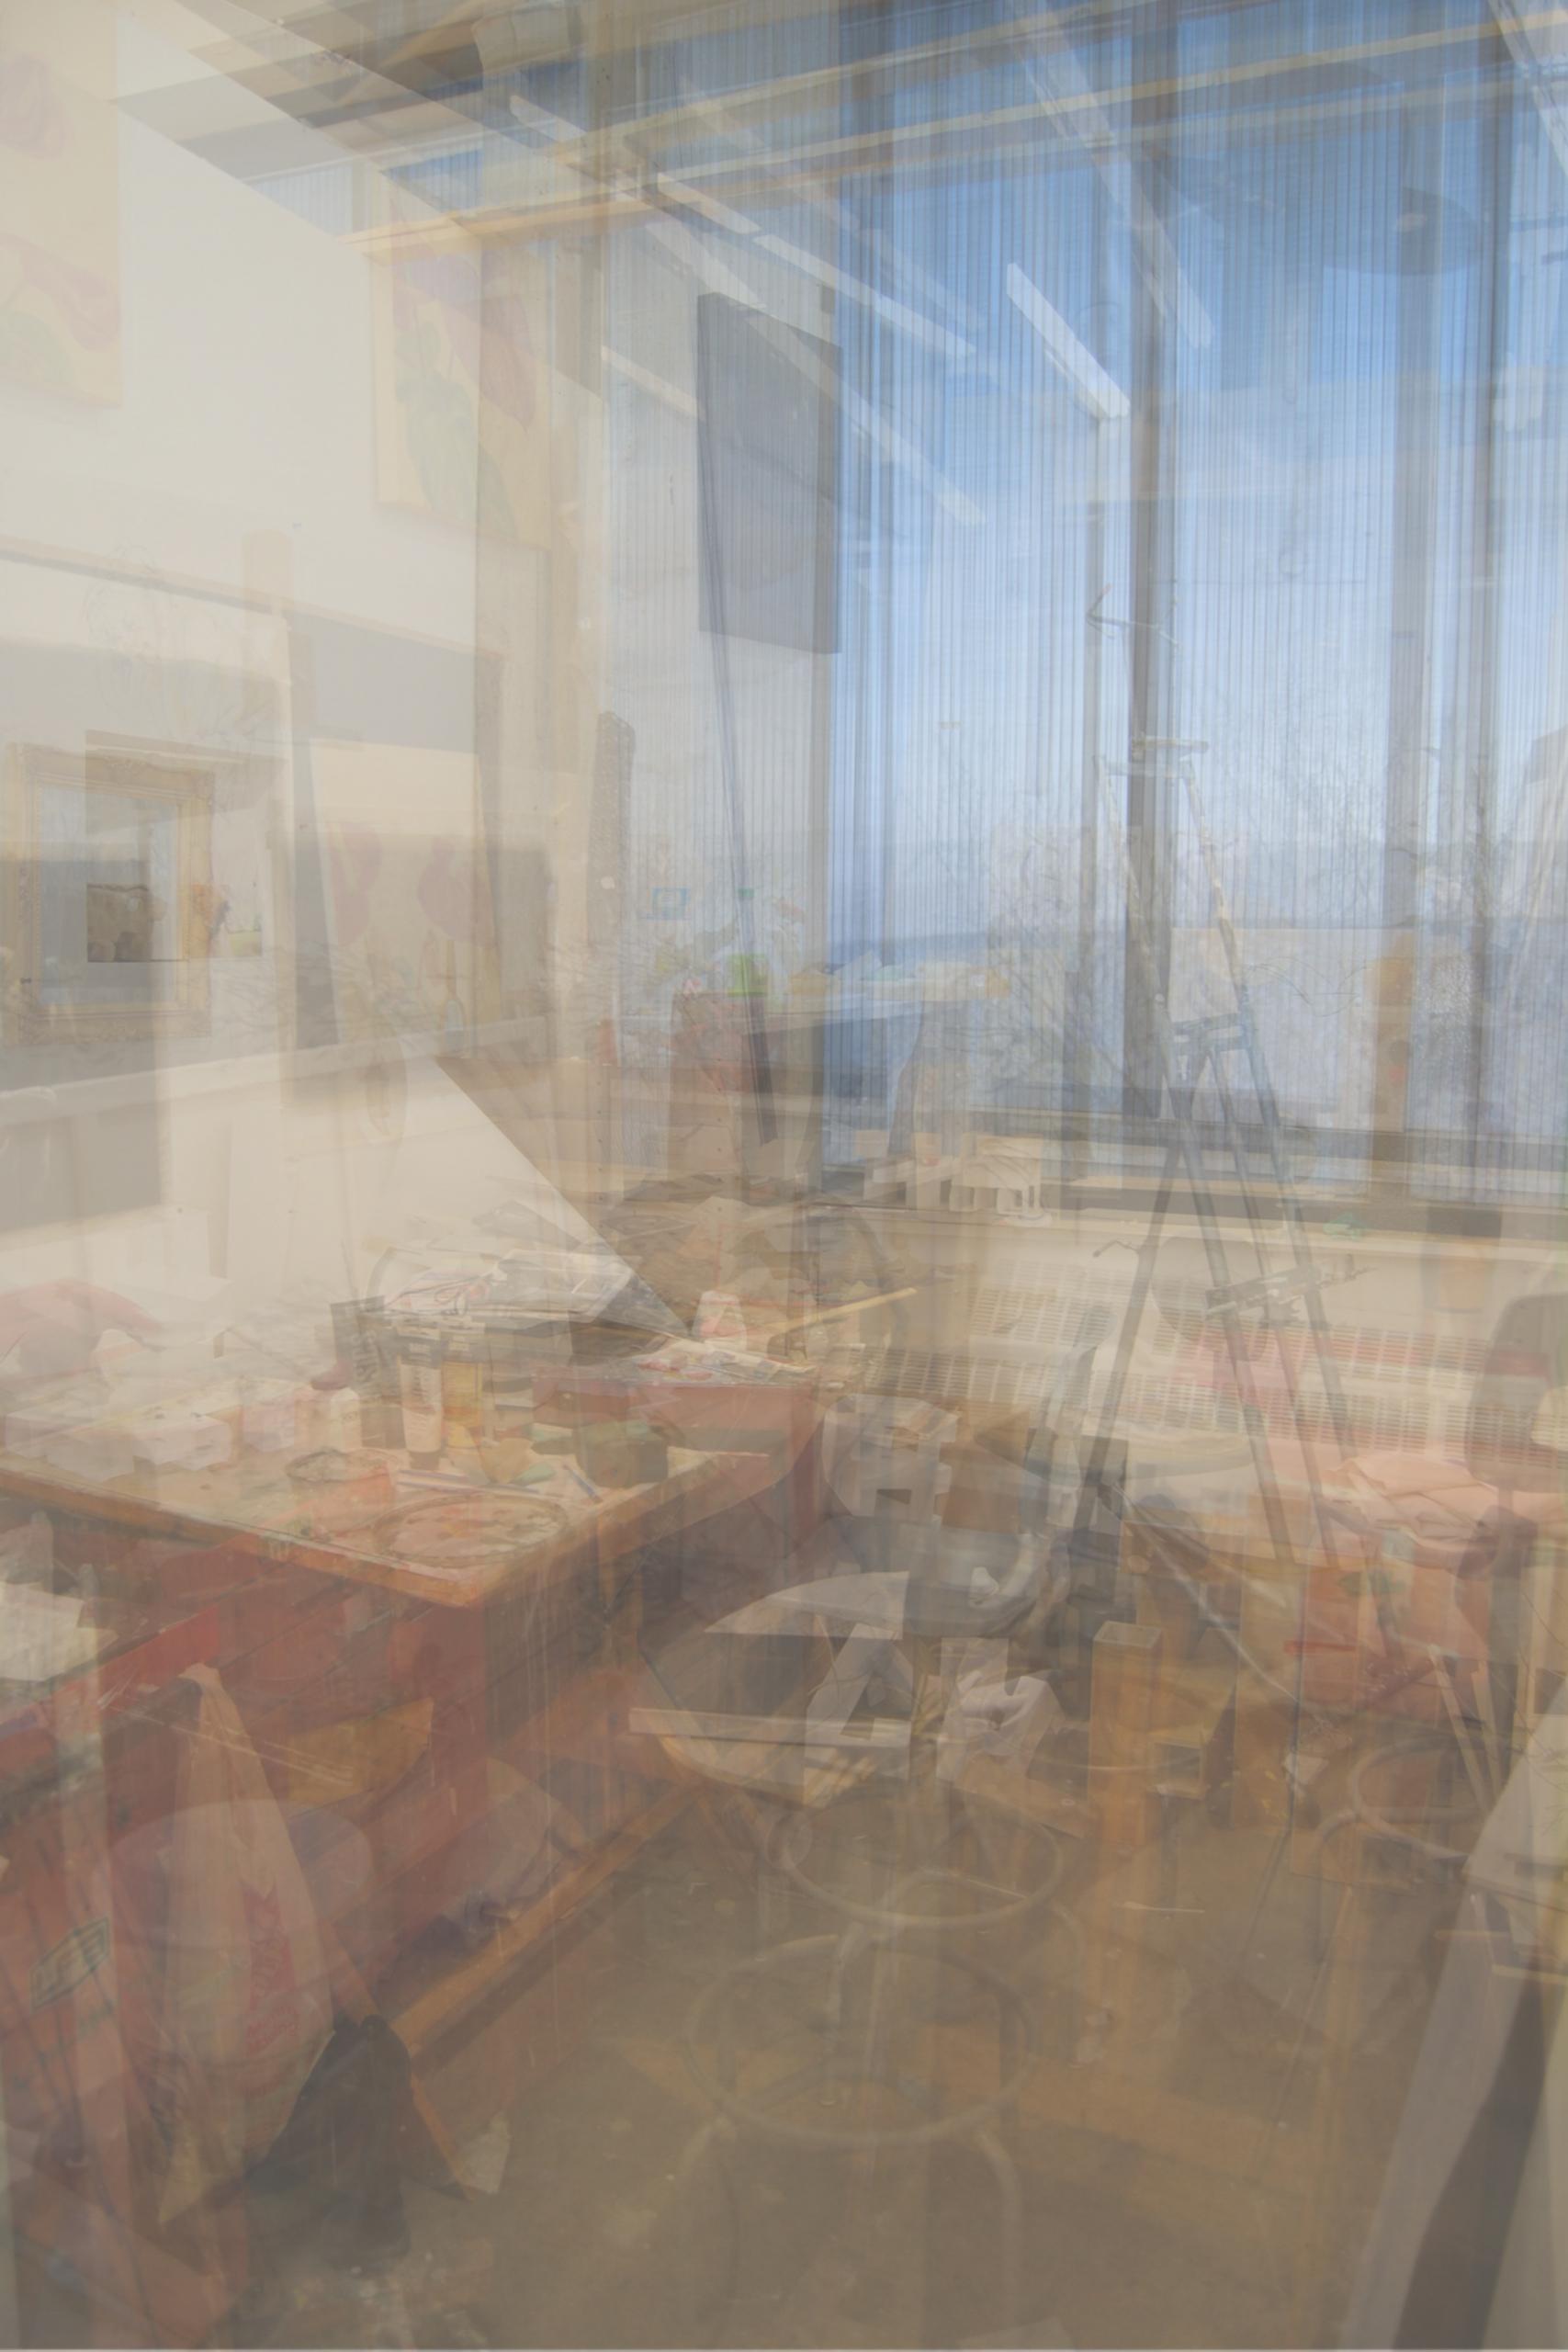 Katie Bruce, Twenty Four Studio Spaces - studios 21-24, 2010.